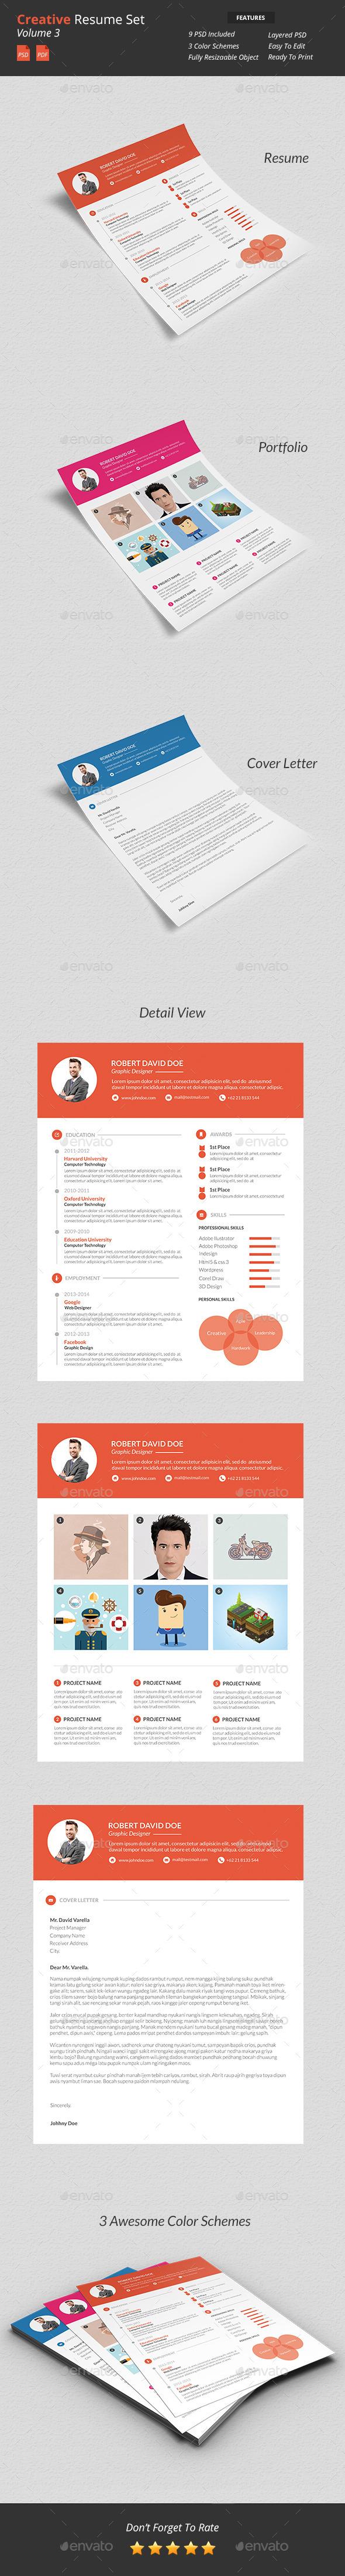 GraphicRiver Creative Resume Set v3 9867871